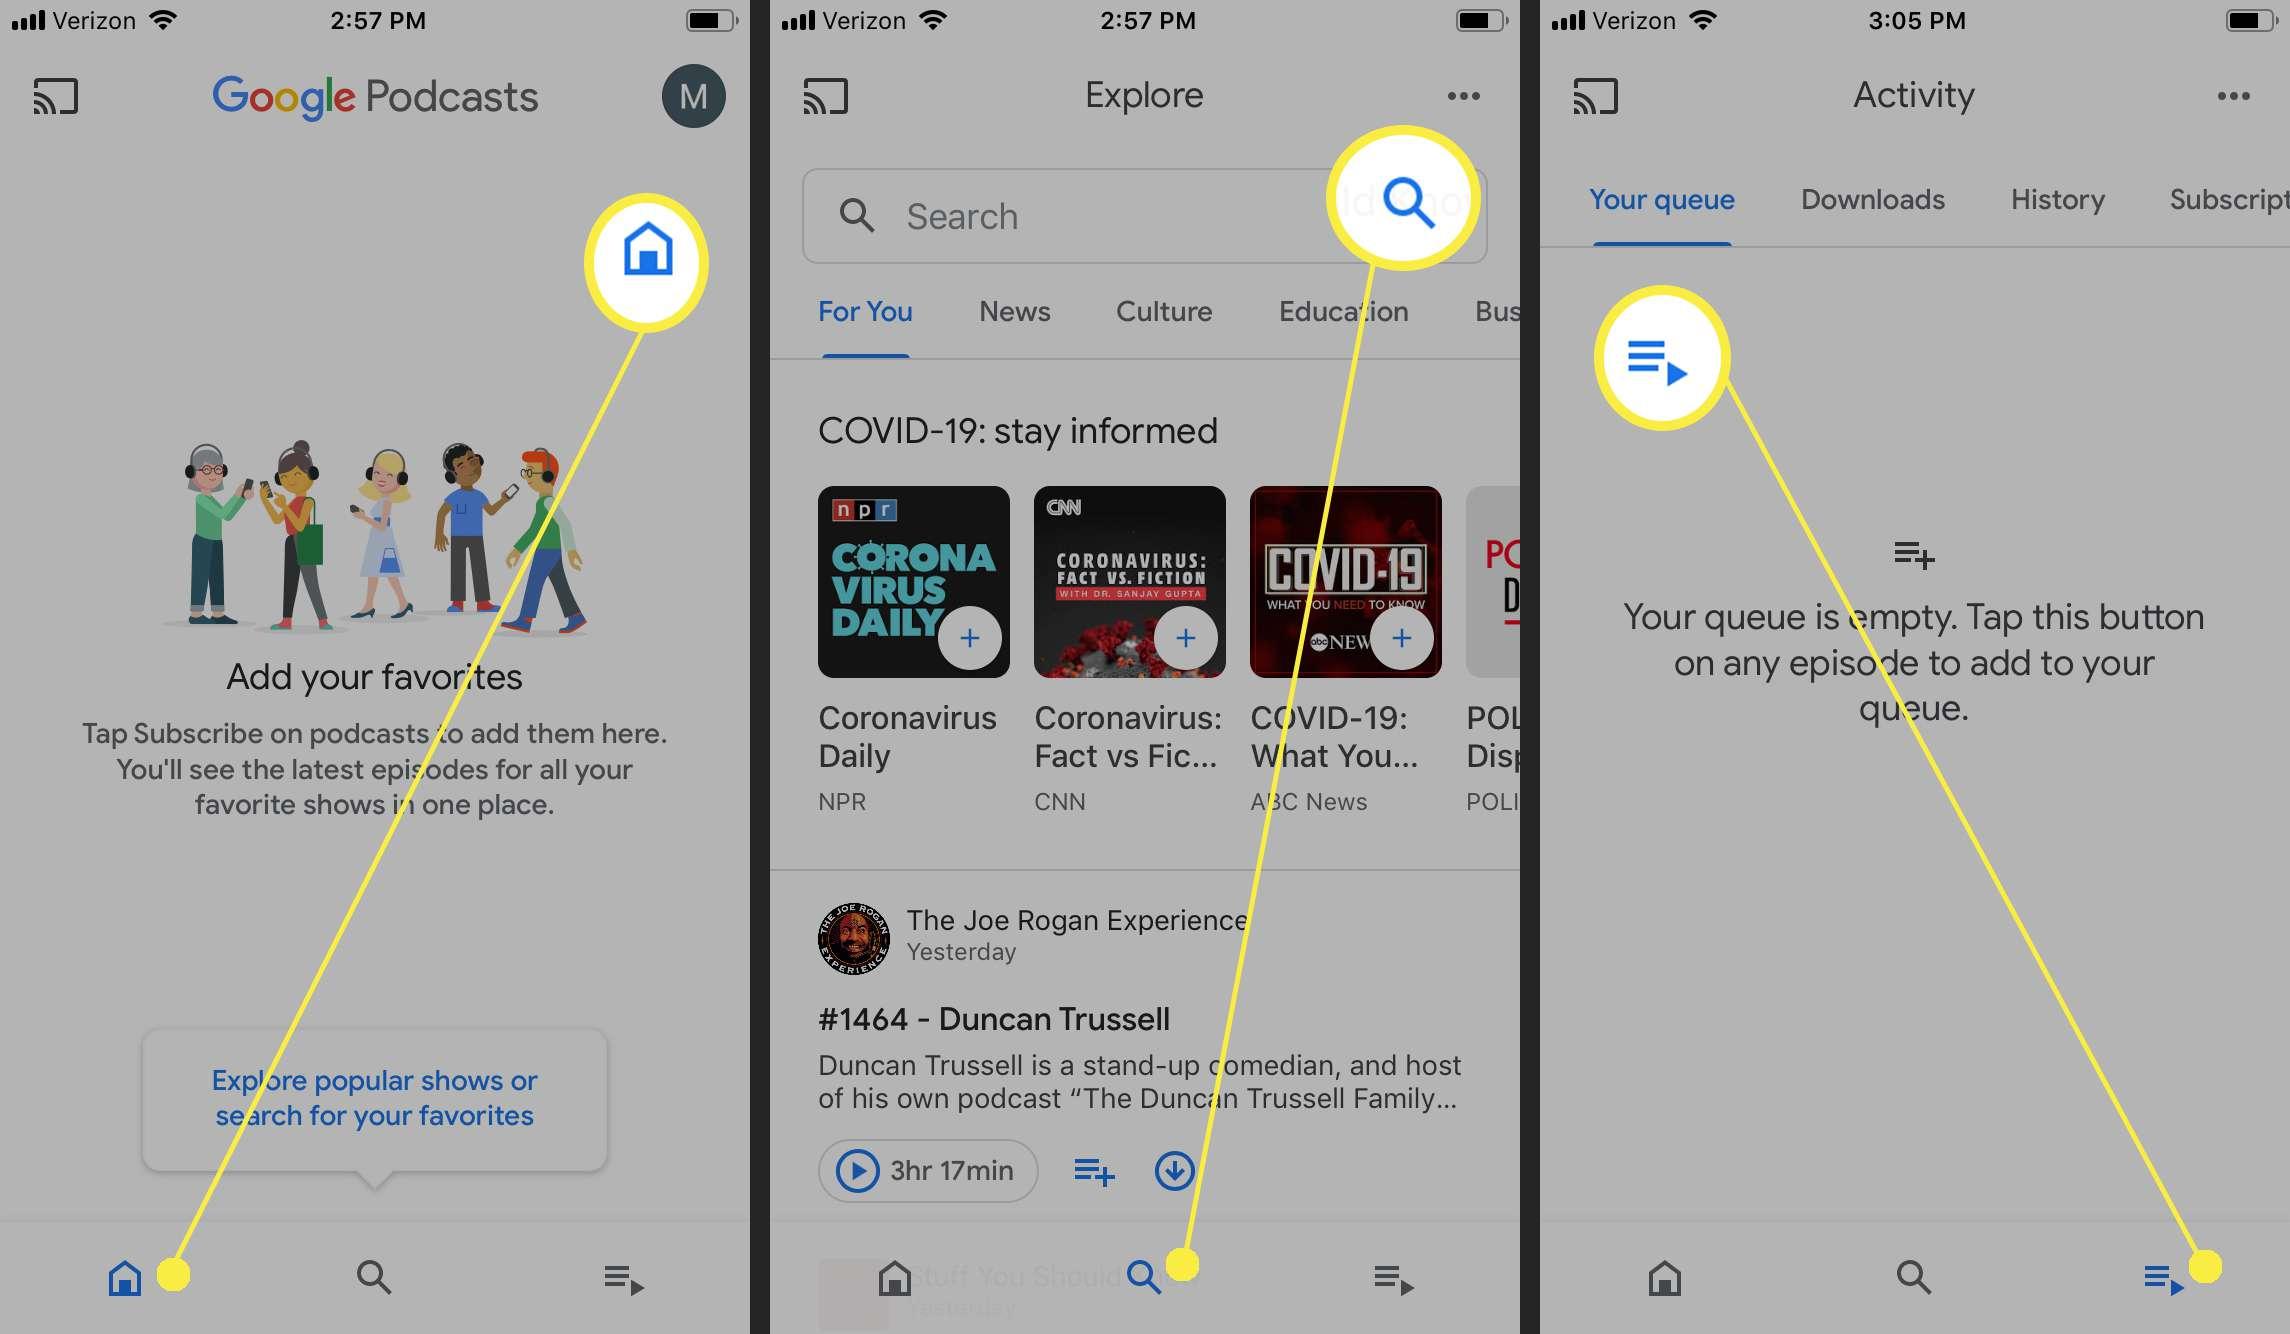 Google Podcasts on iOS.